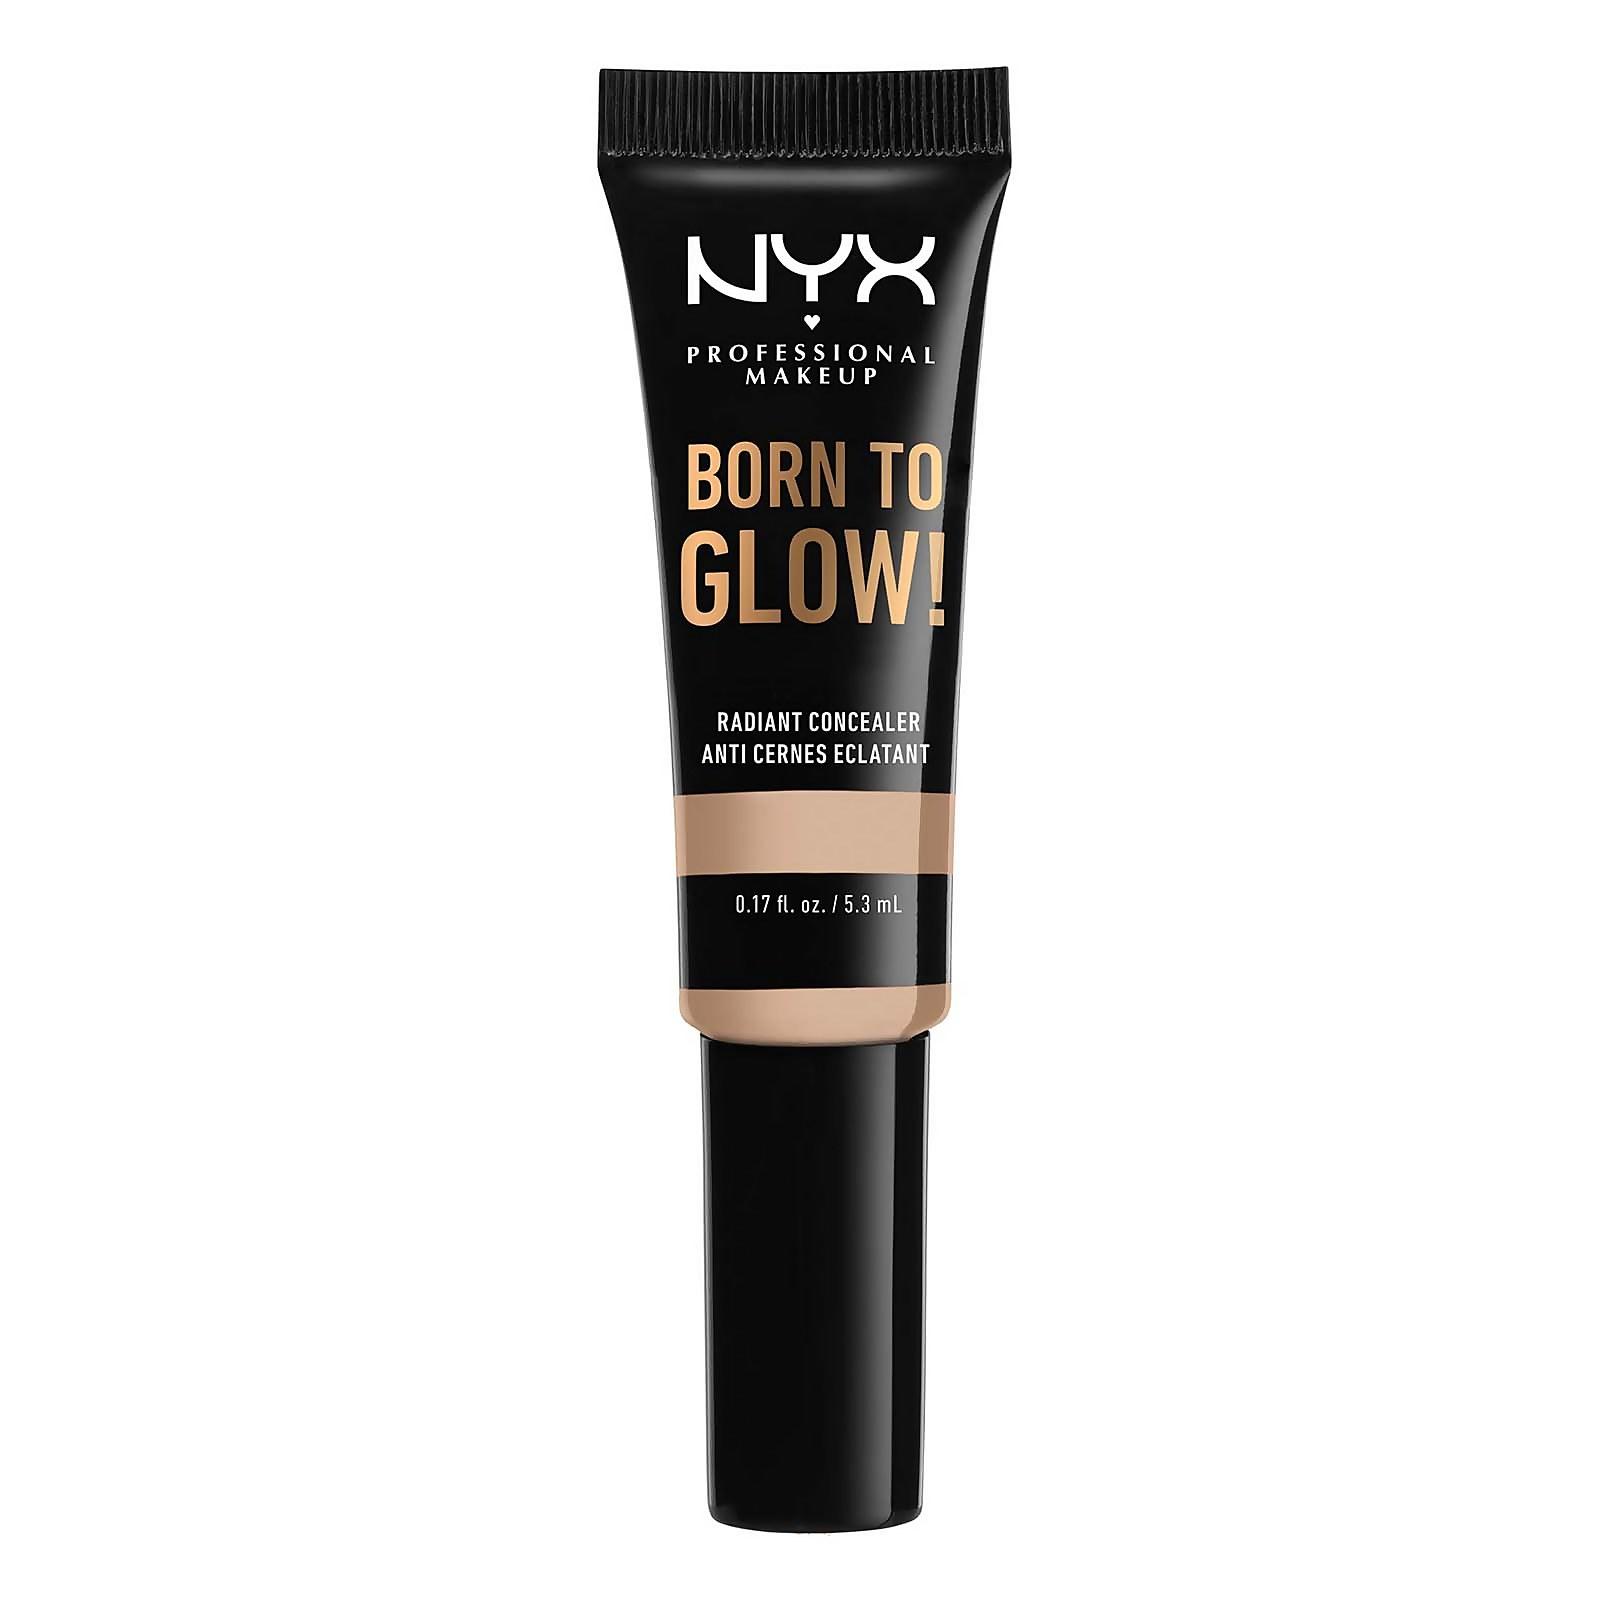 Купить NYX Professional Makeup Born to Glow Radiant Concealer (Various Shades) - Alabaster